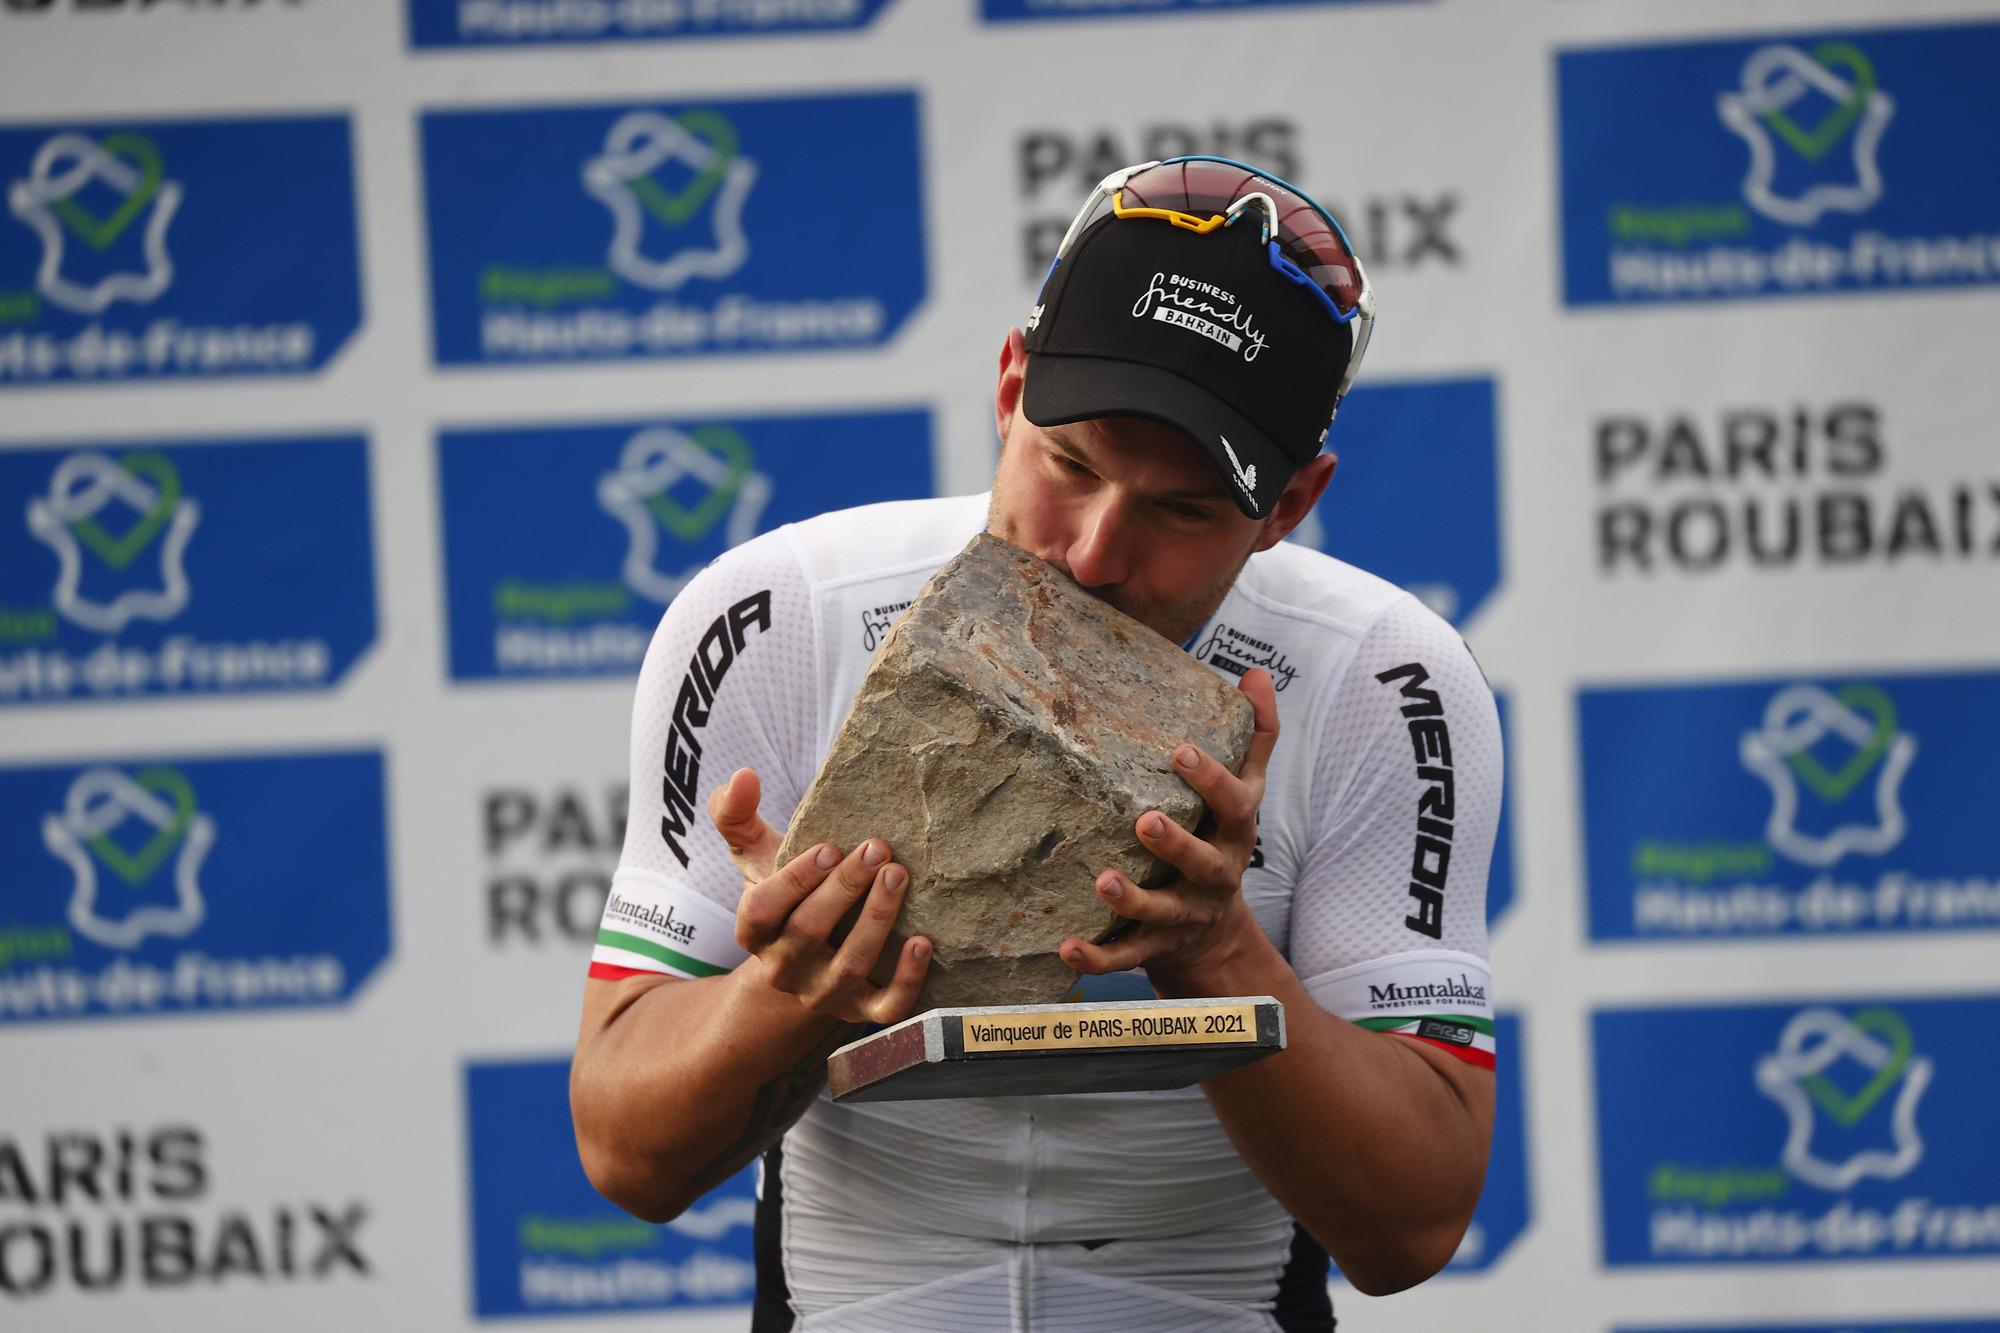 Paris Roubaix 2021 118th Edition Denain Roubaix 2577 km 03102021 Sonny Colbrelli ITA Bahrain Victorious photo Luca BettiniBettiniPhoto2021